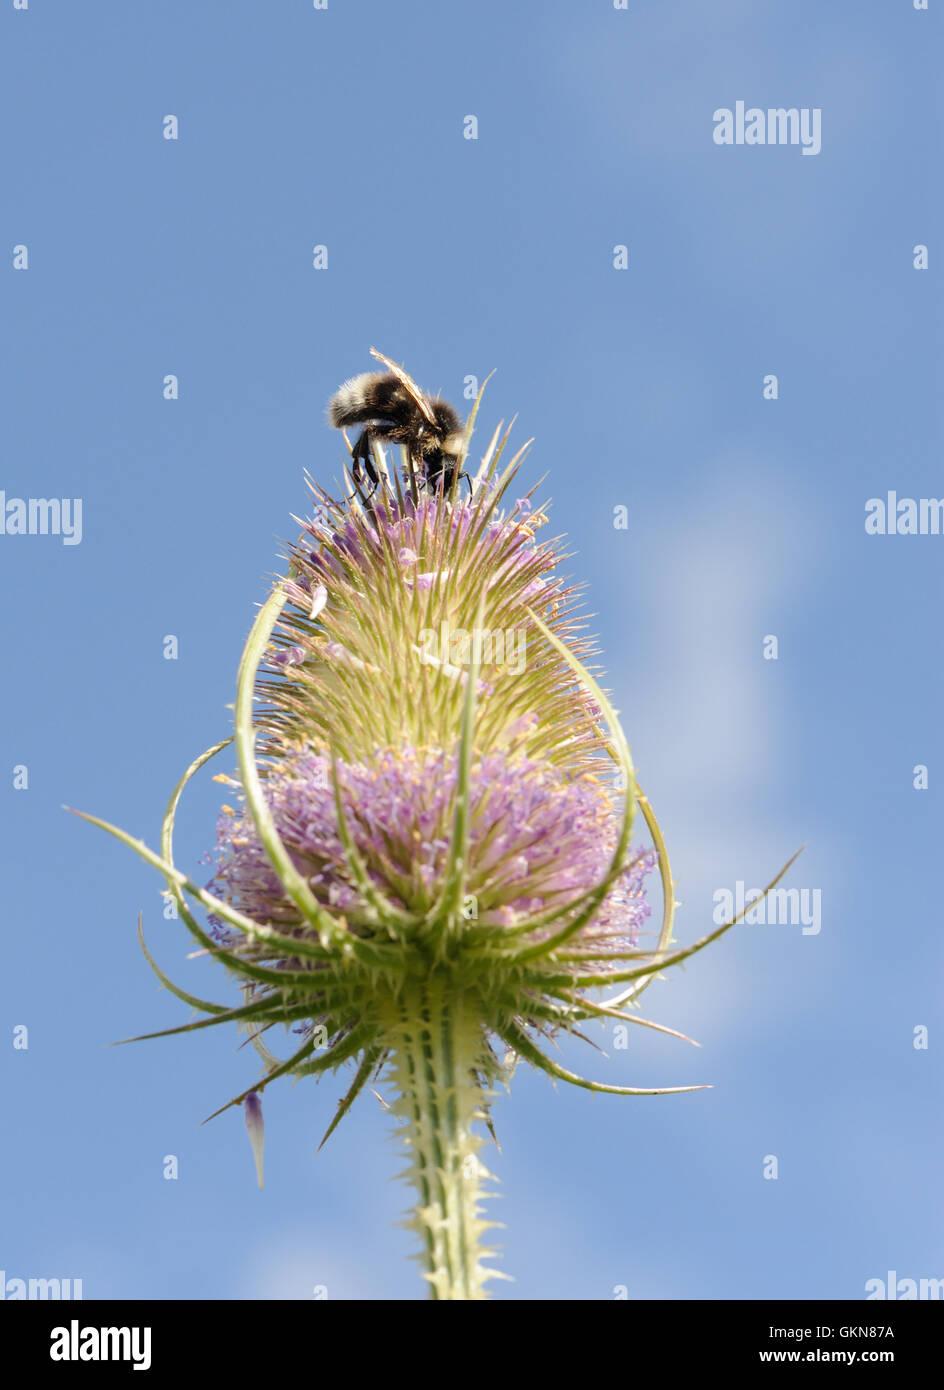 A parasitic cuckoo bee the gypsy cuckoo bumblebee (Bombus bohemicus) feeding on a teasel (Dipsacus fullonum) flower - Stock Image